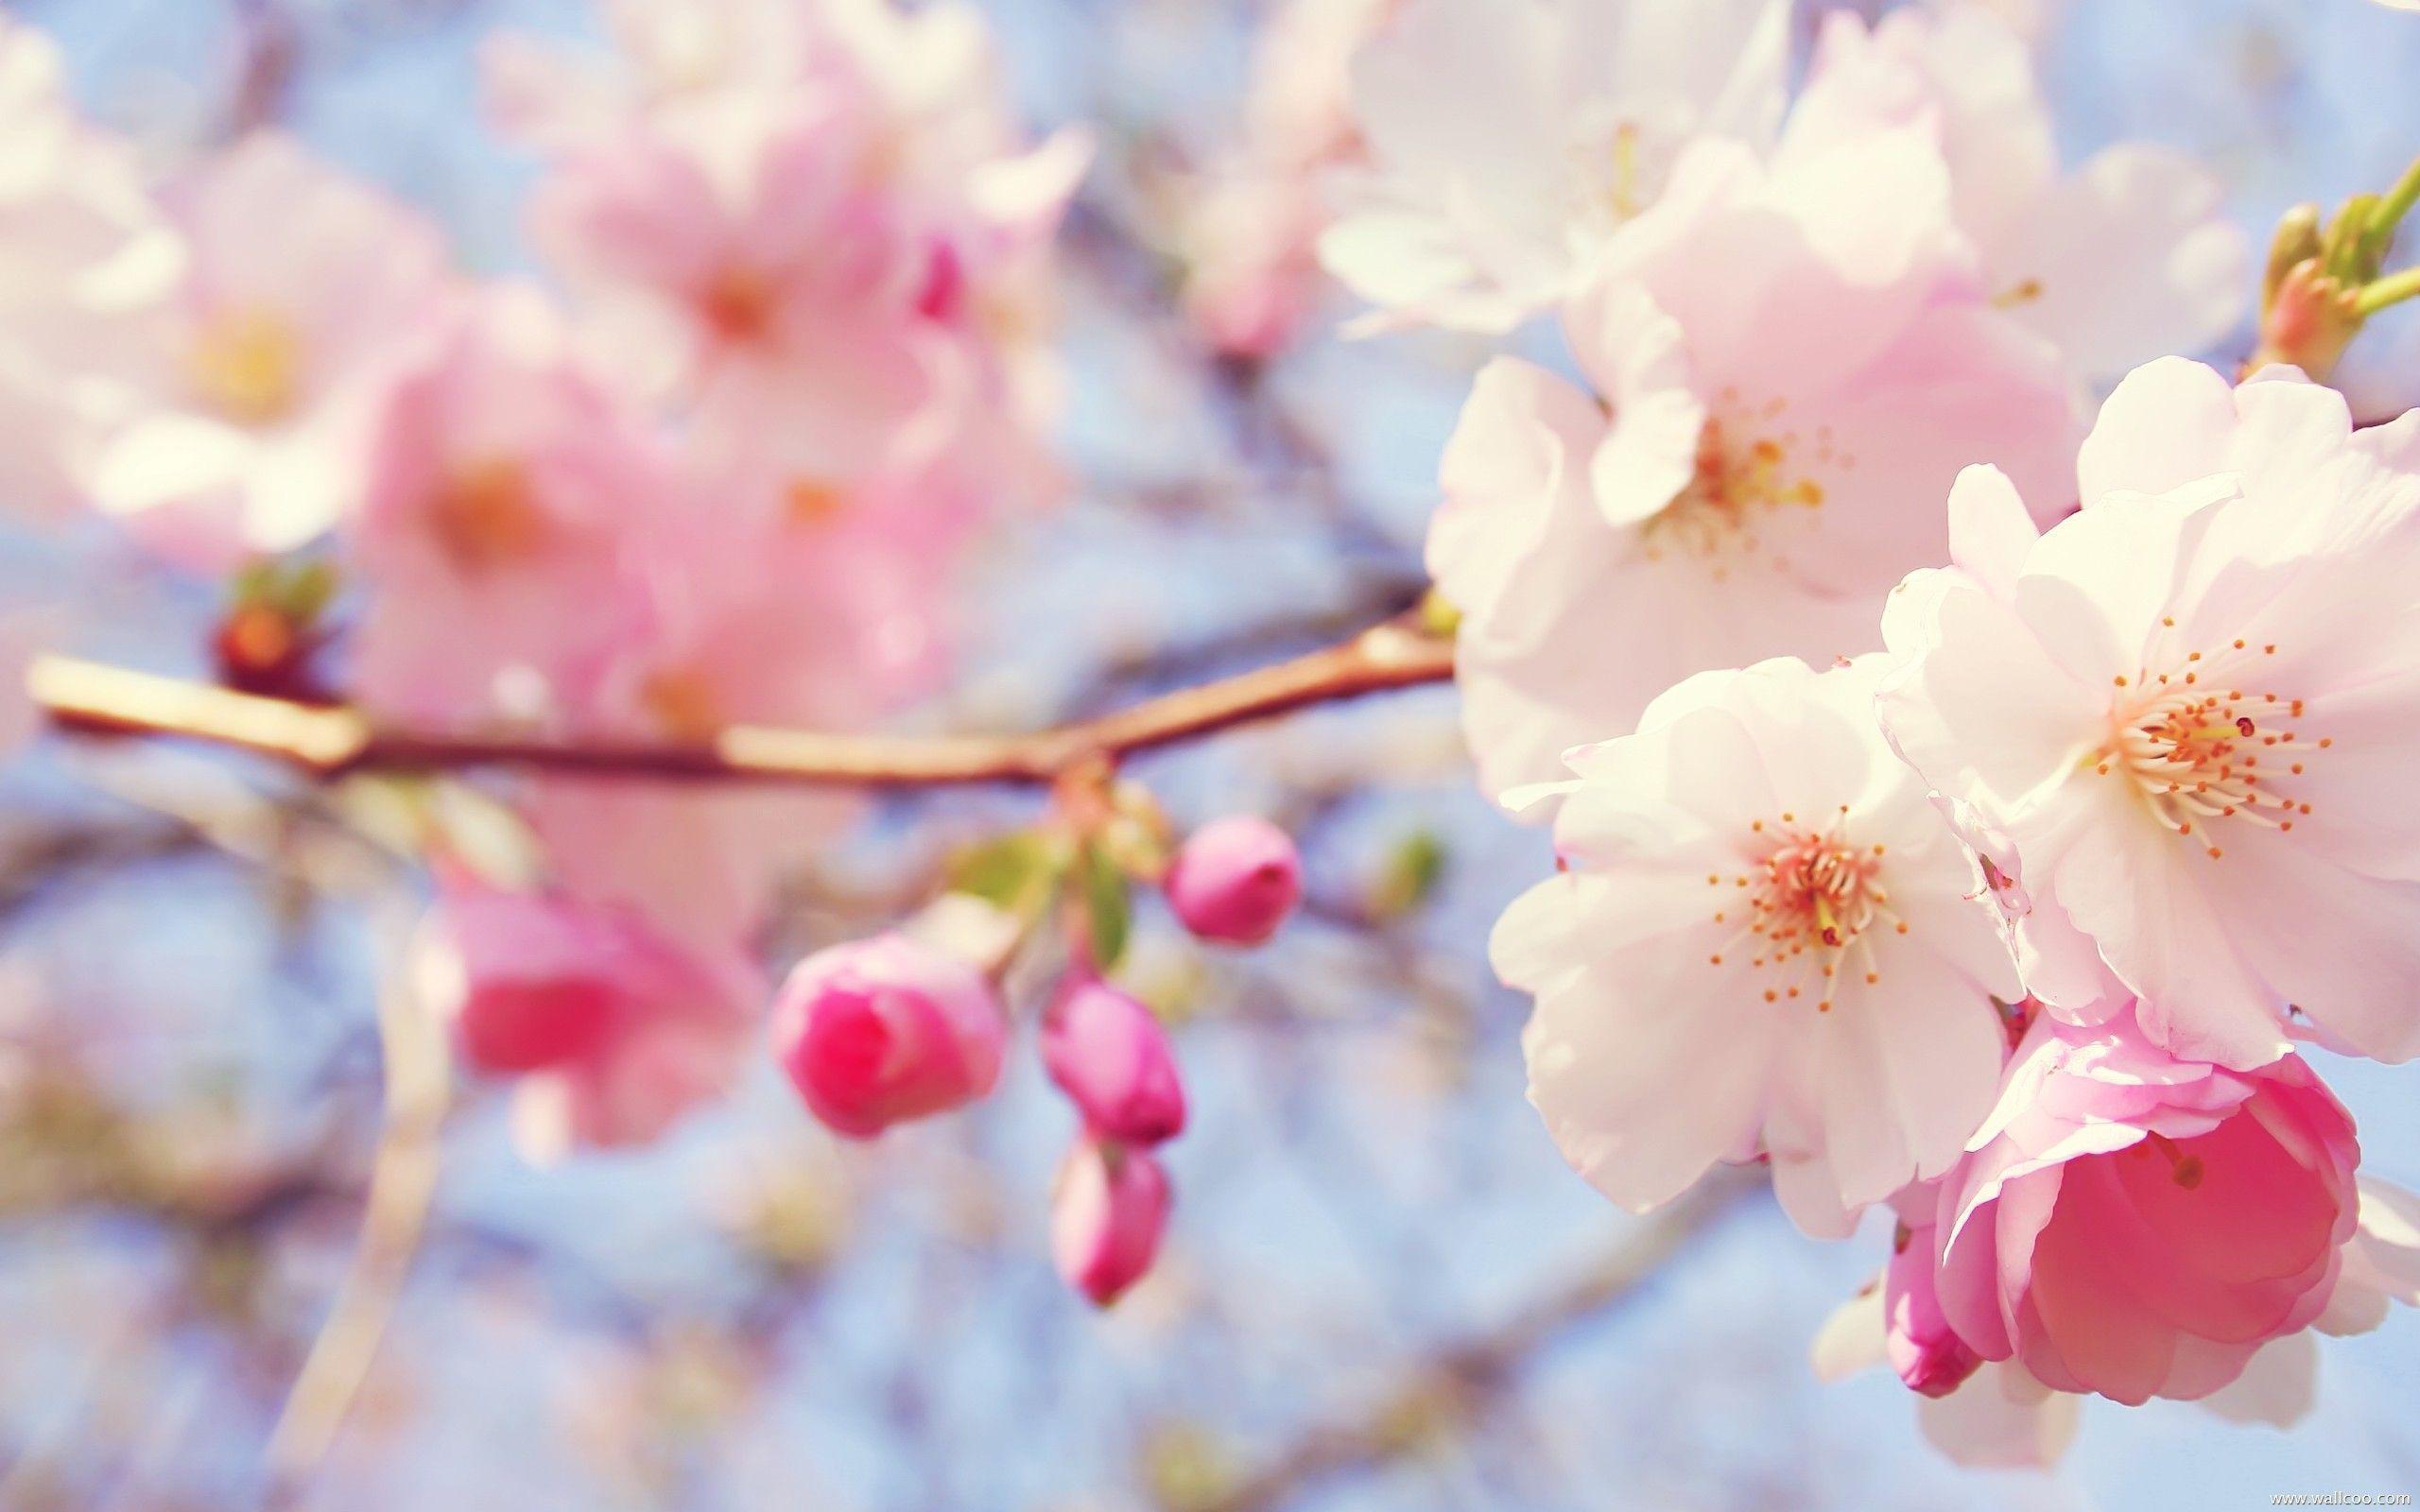 Pink Flowers Hd Wallpapers Top Free Pink Flowers Hd